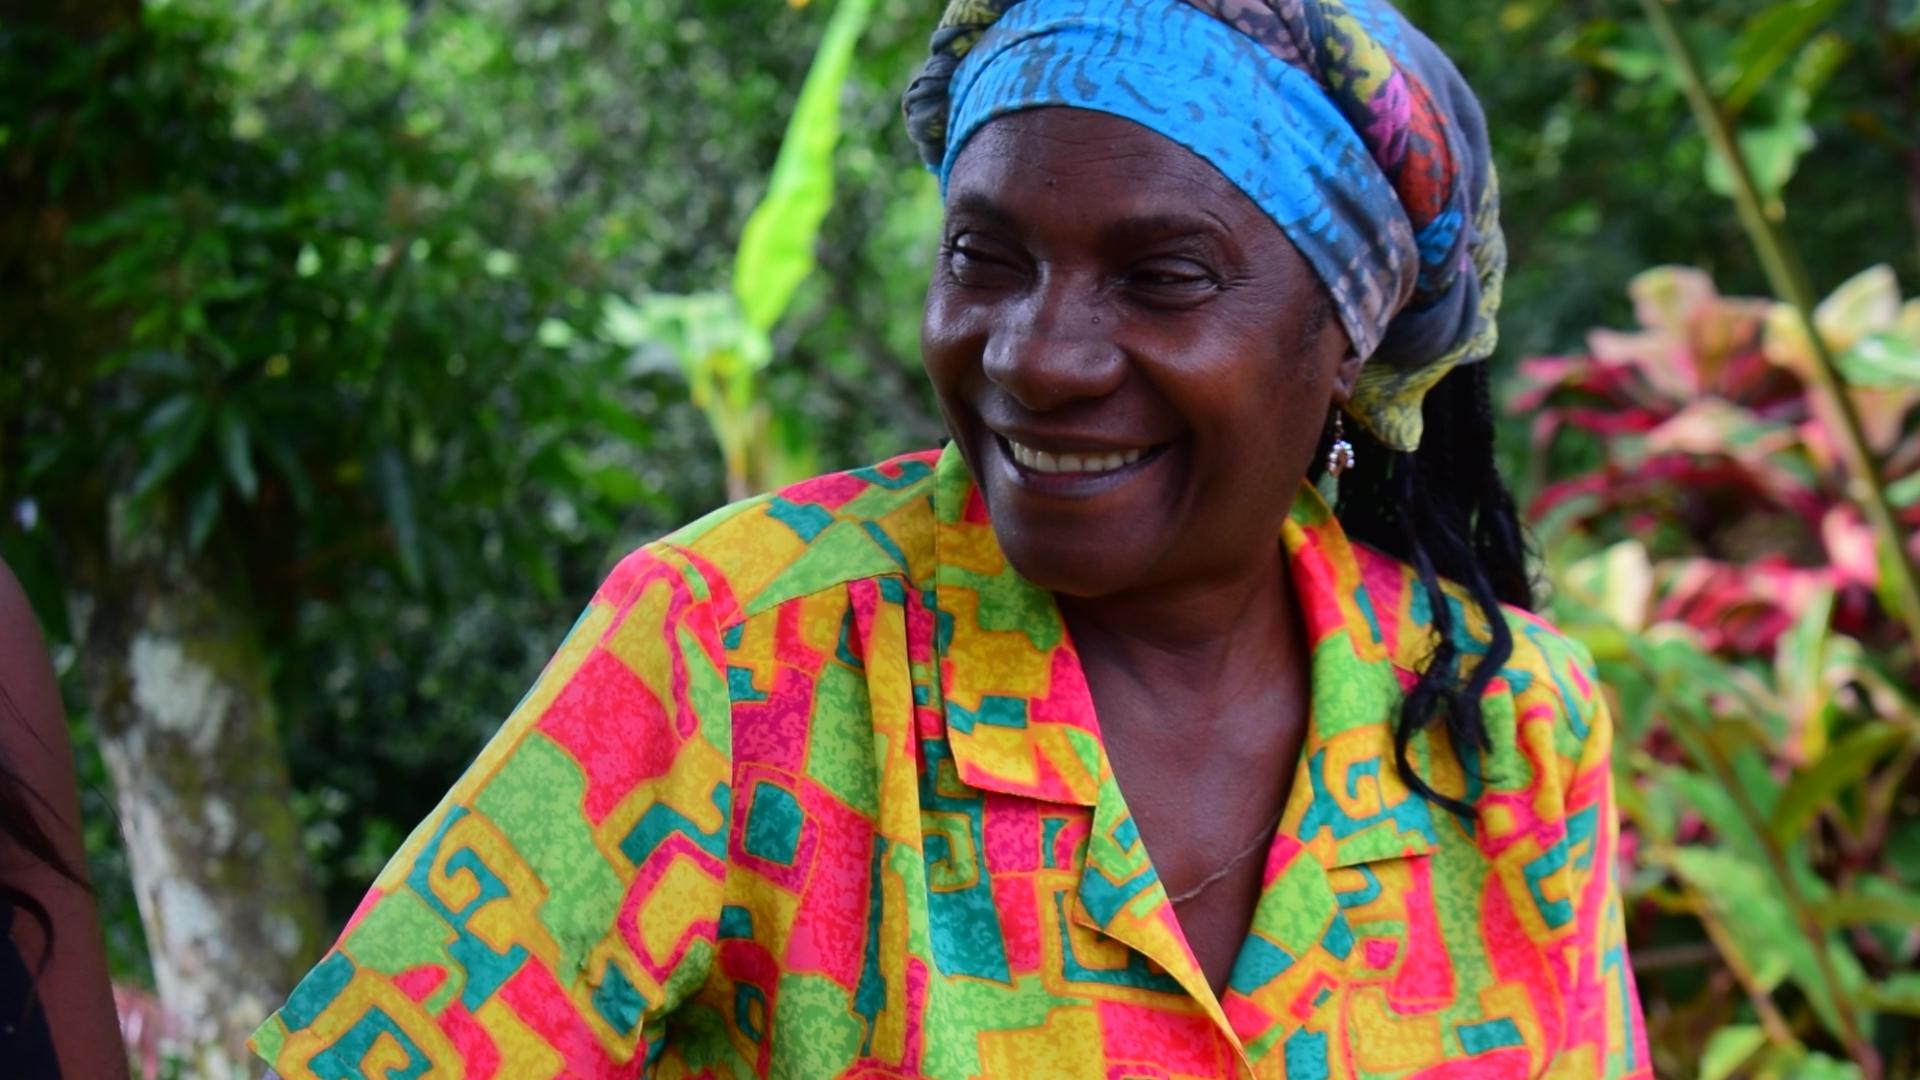 polifonia mujer afro del cauca colombiano